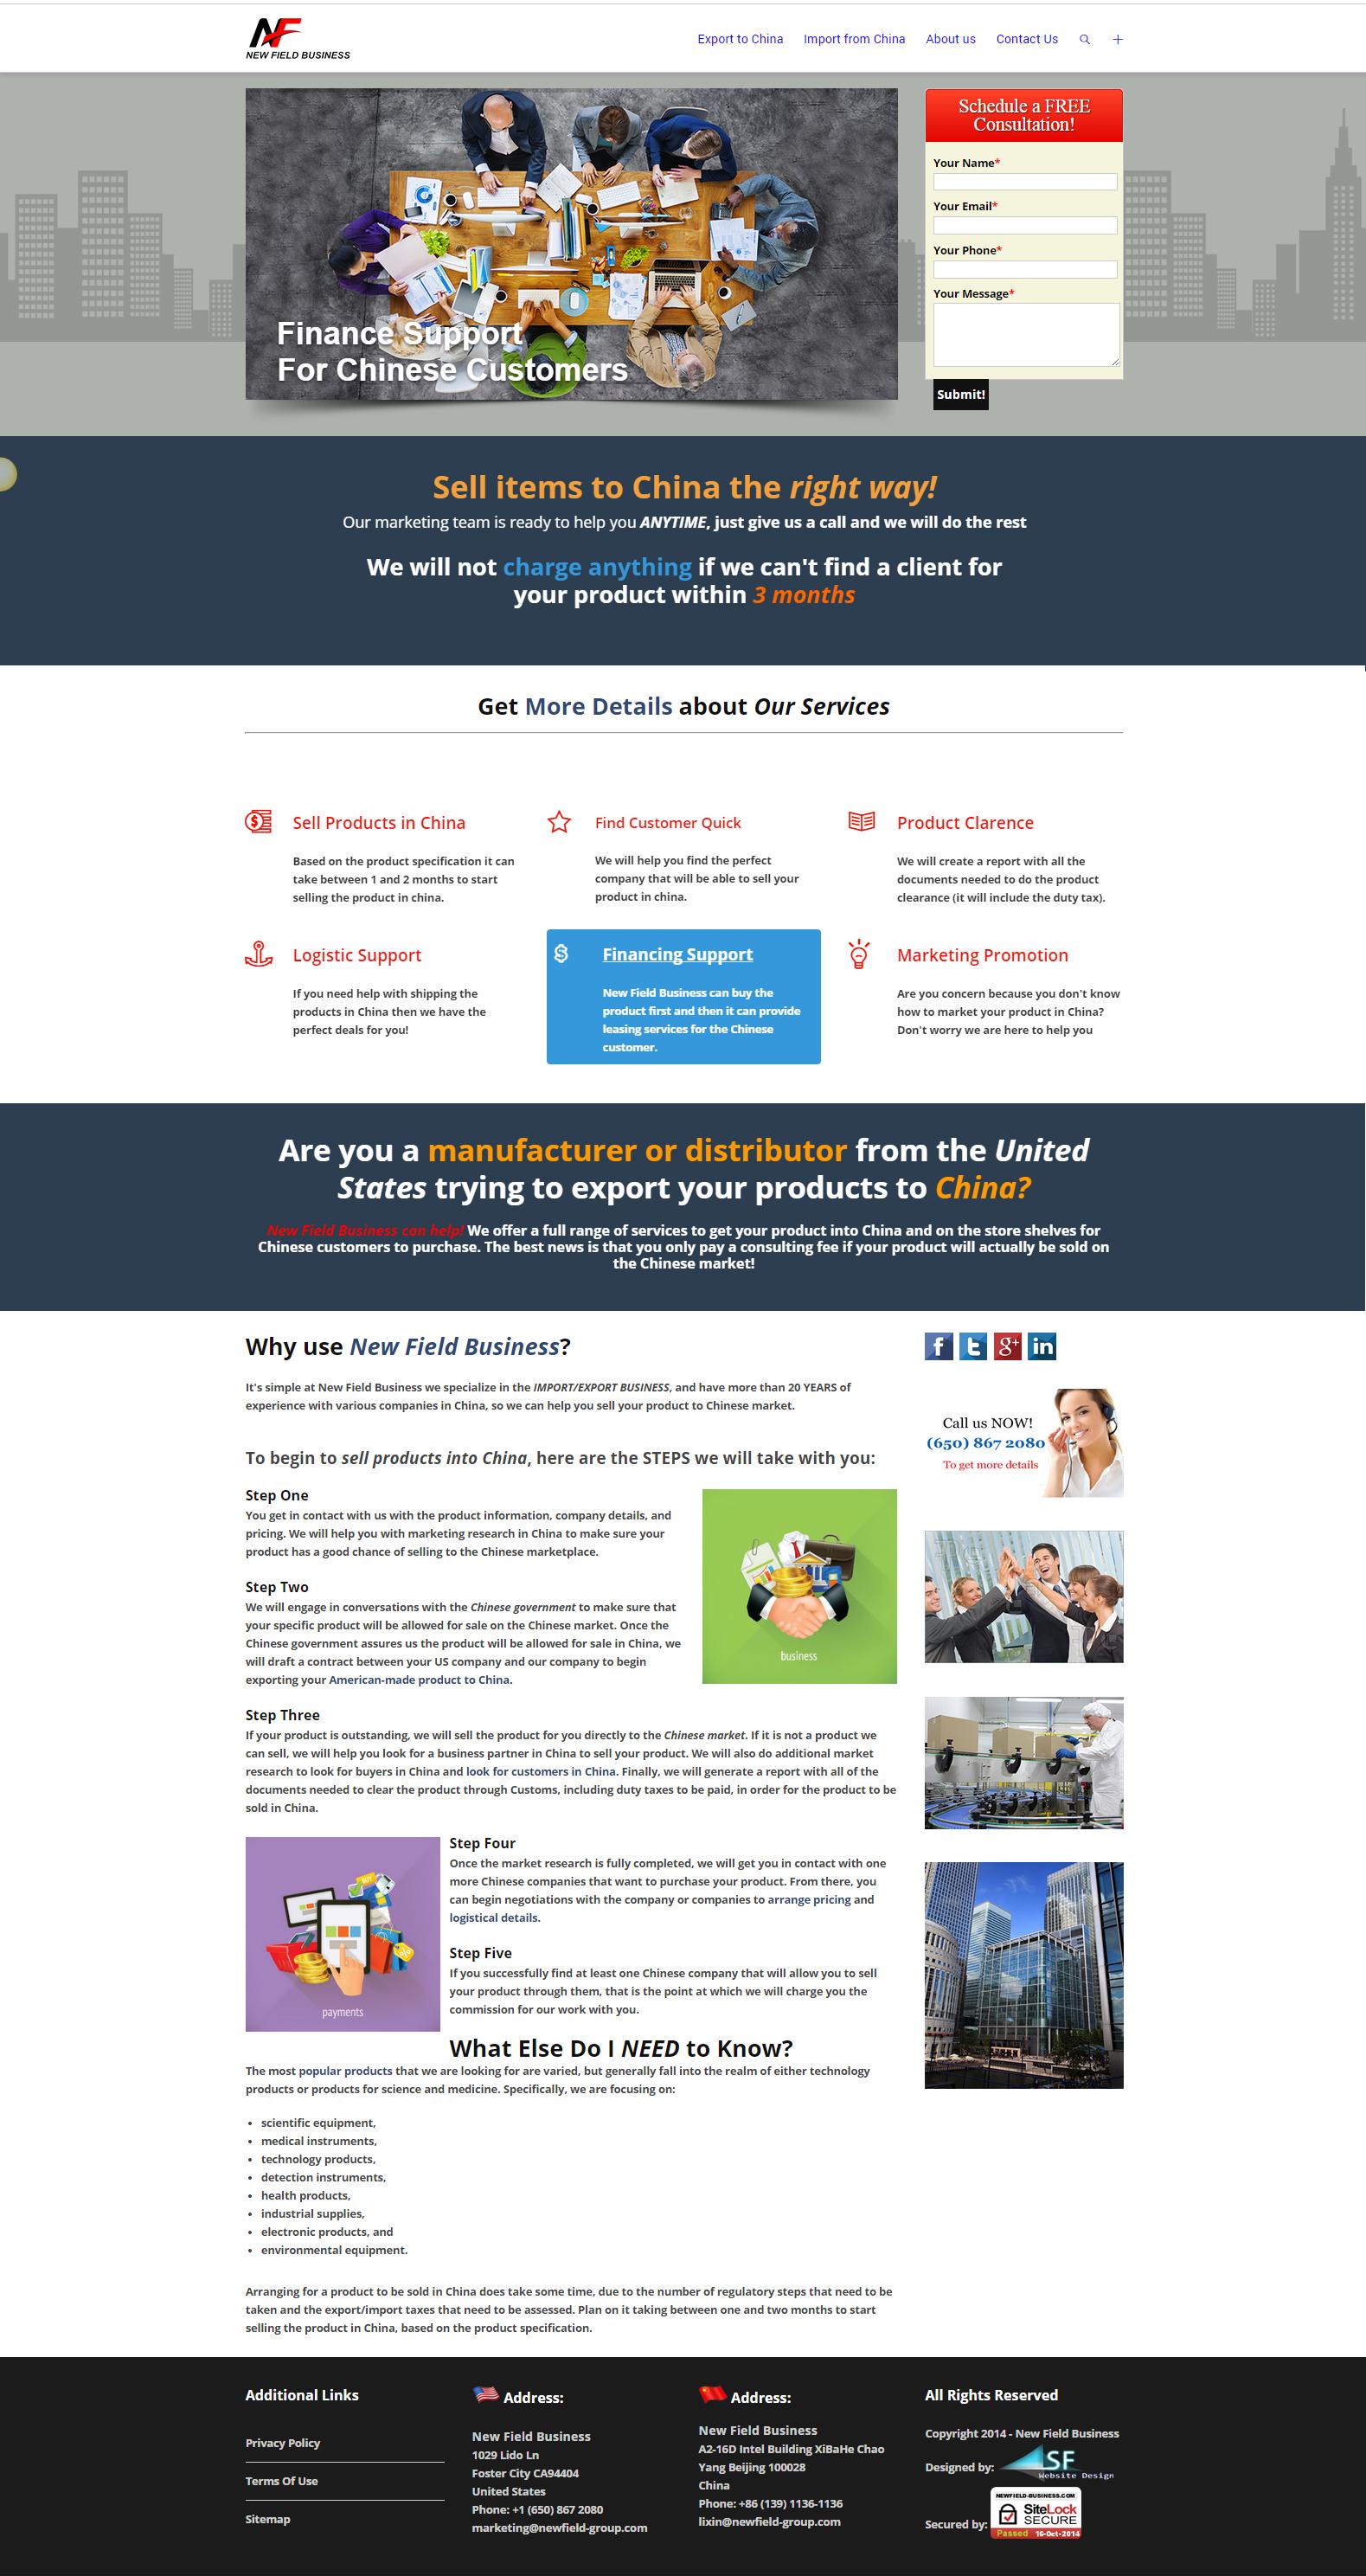 Newfield-Business-website-design-home